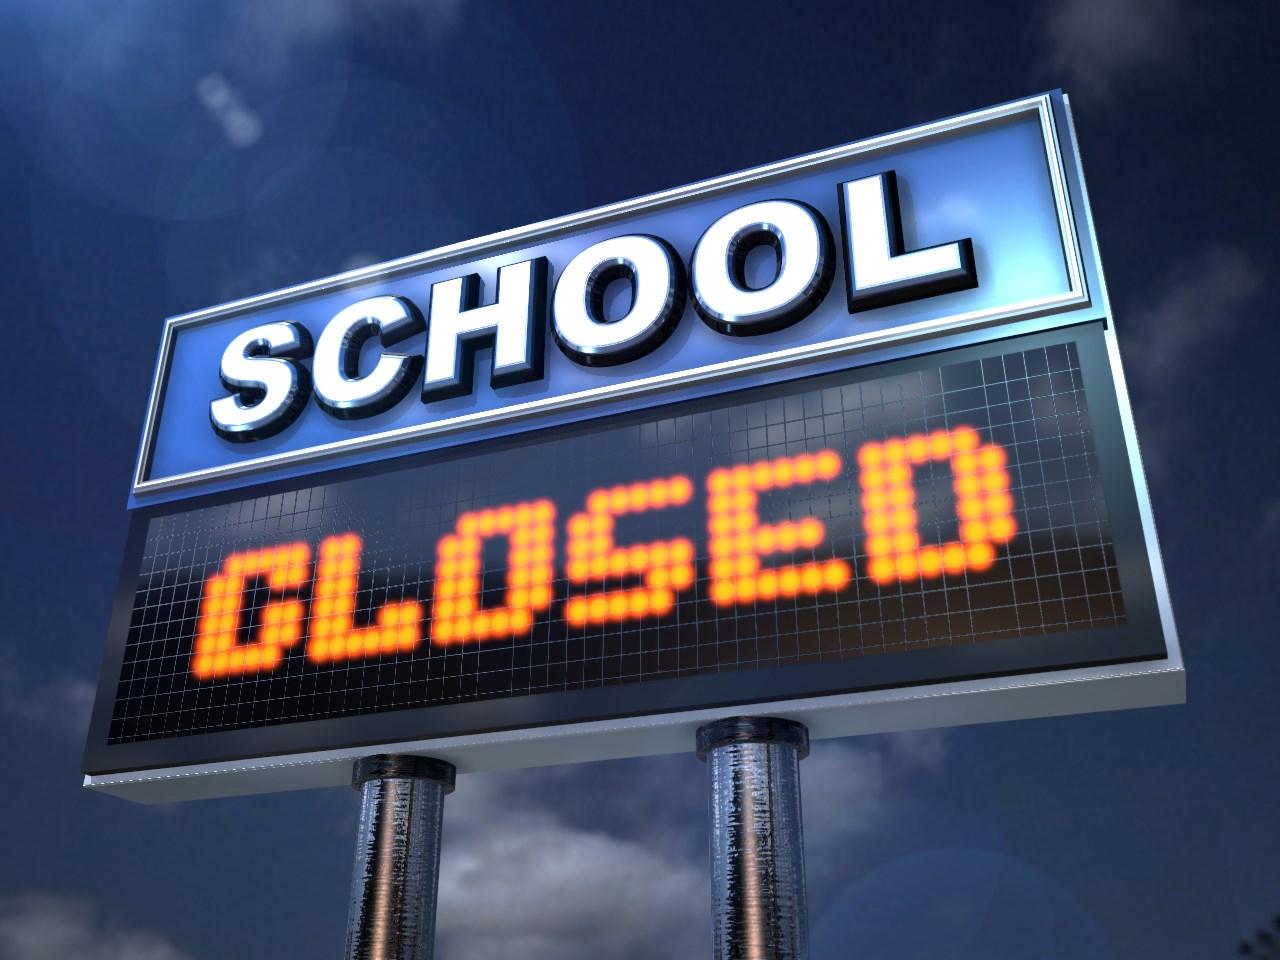 SCHOOL CLOSED_1504038101113.jpg